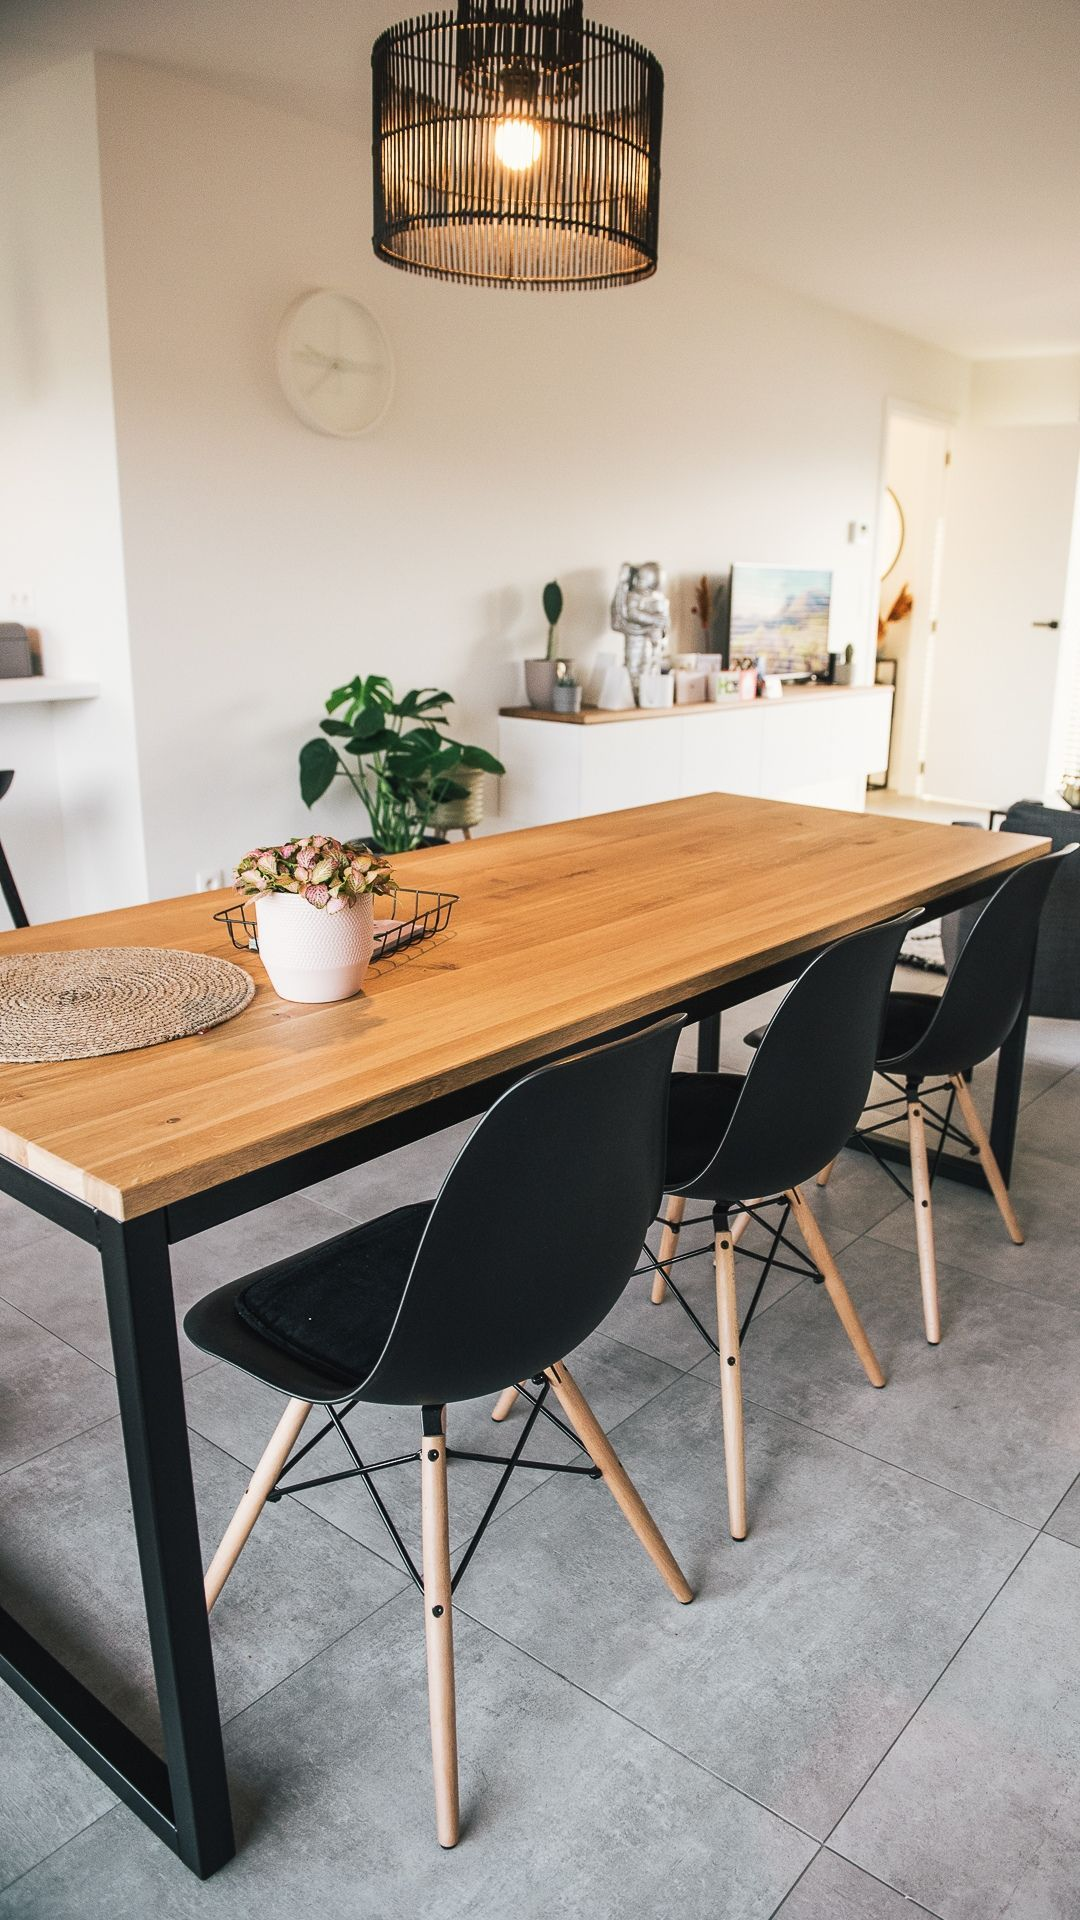 Tafel Olav Eiken U Frame Zwart Woodville In 2020 Tafel Eikenhout Industriele Tafel Tafel